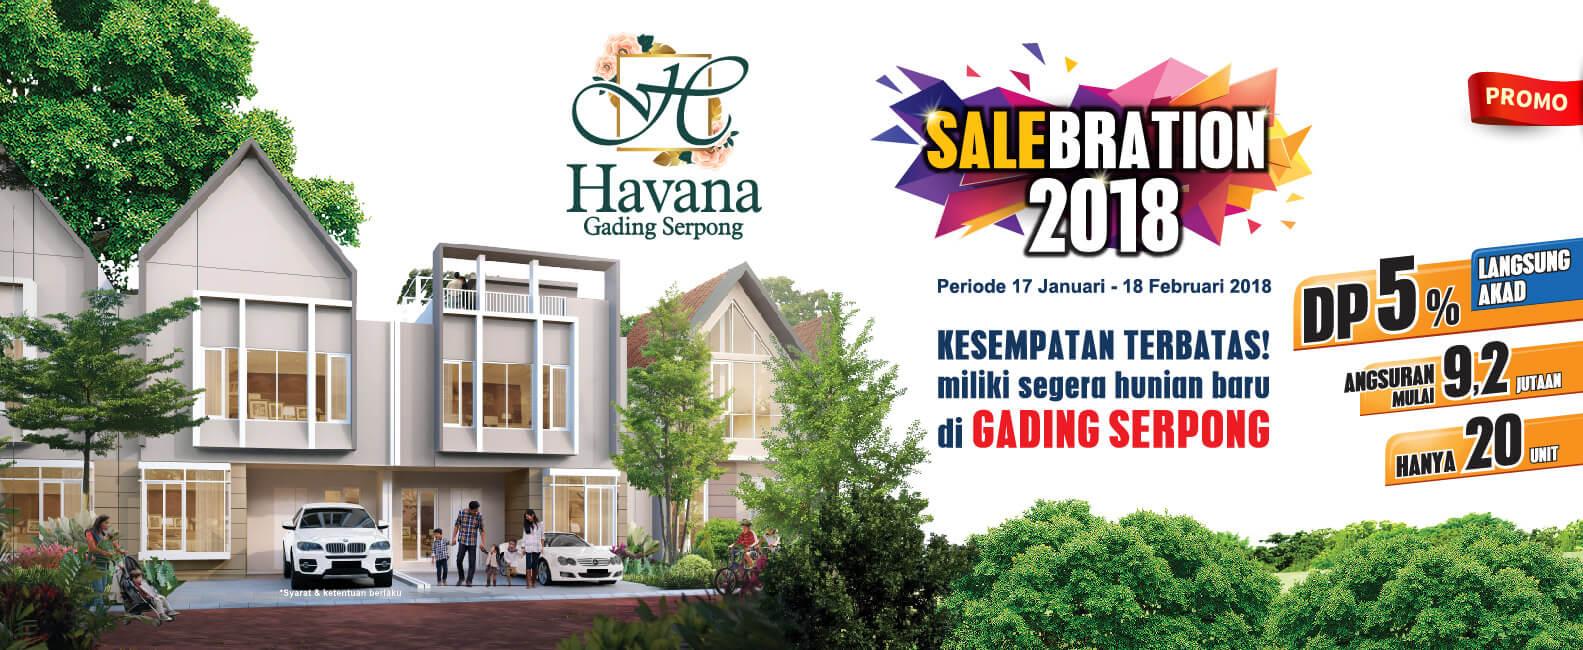 Promo 2018 Beli Rumah Cluster Havana Gading Serpong